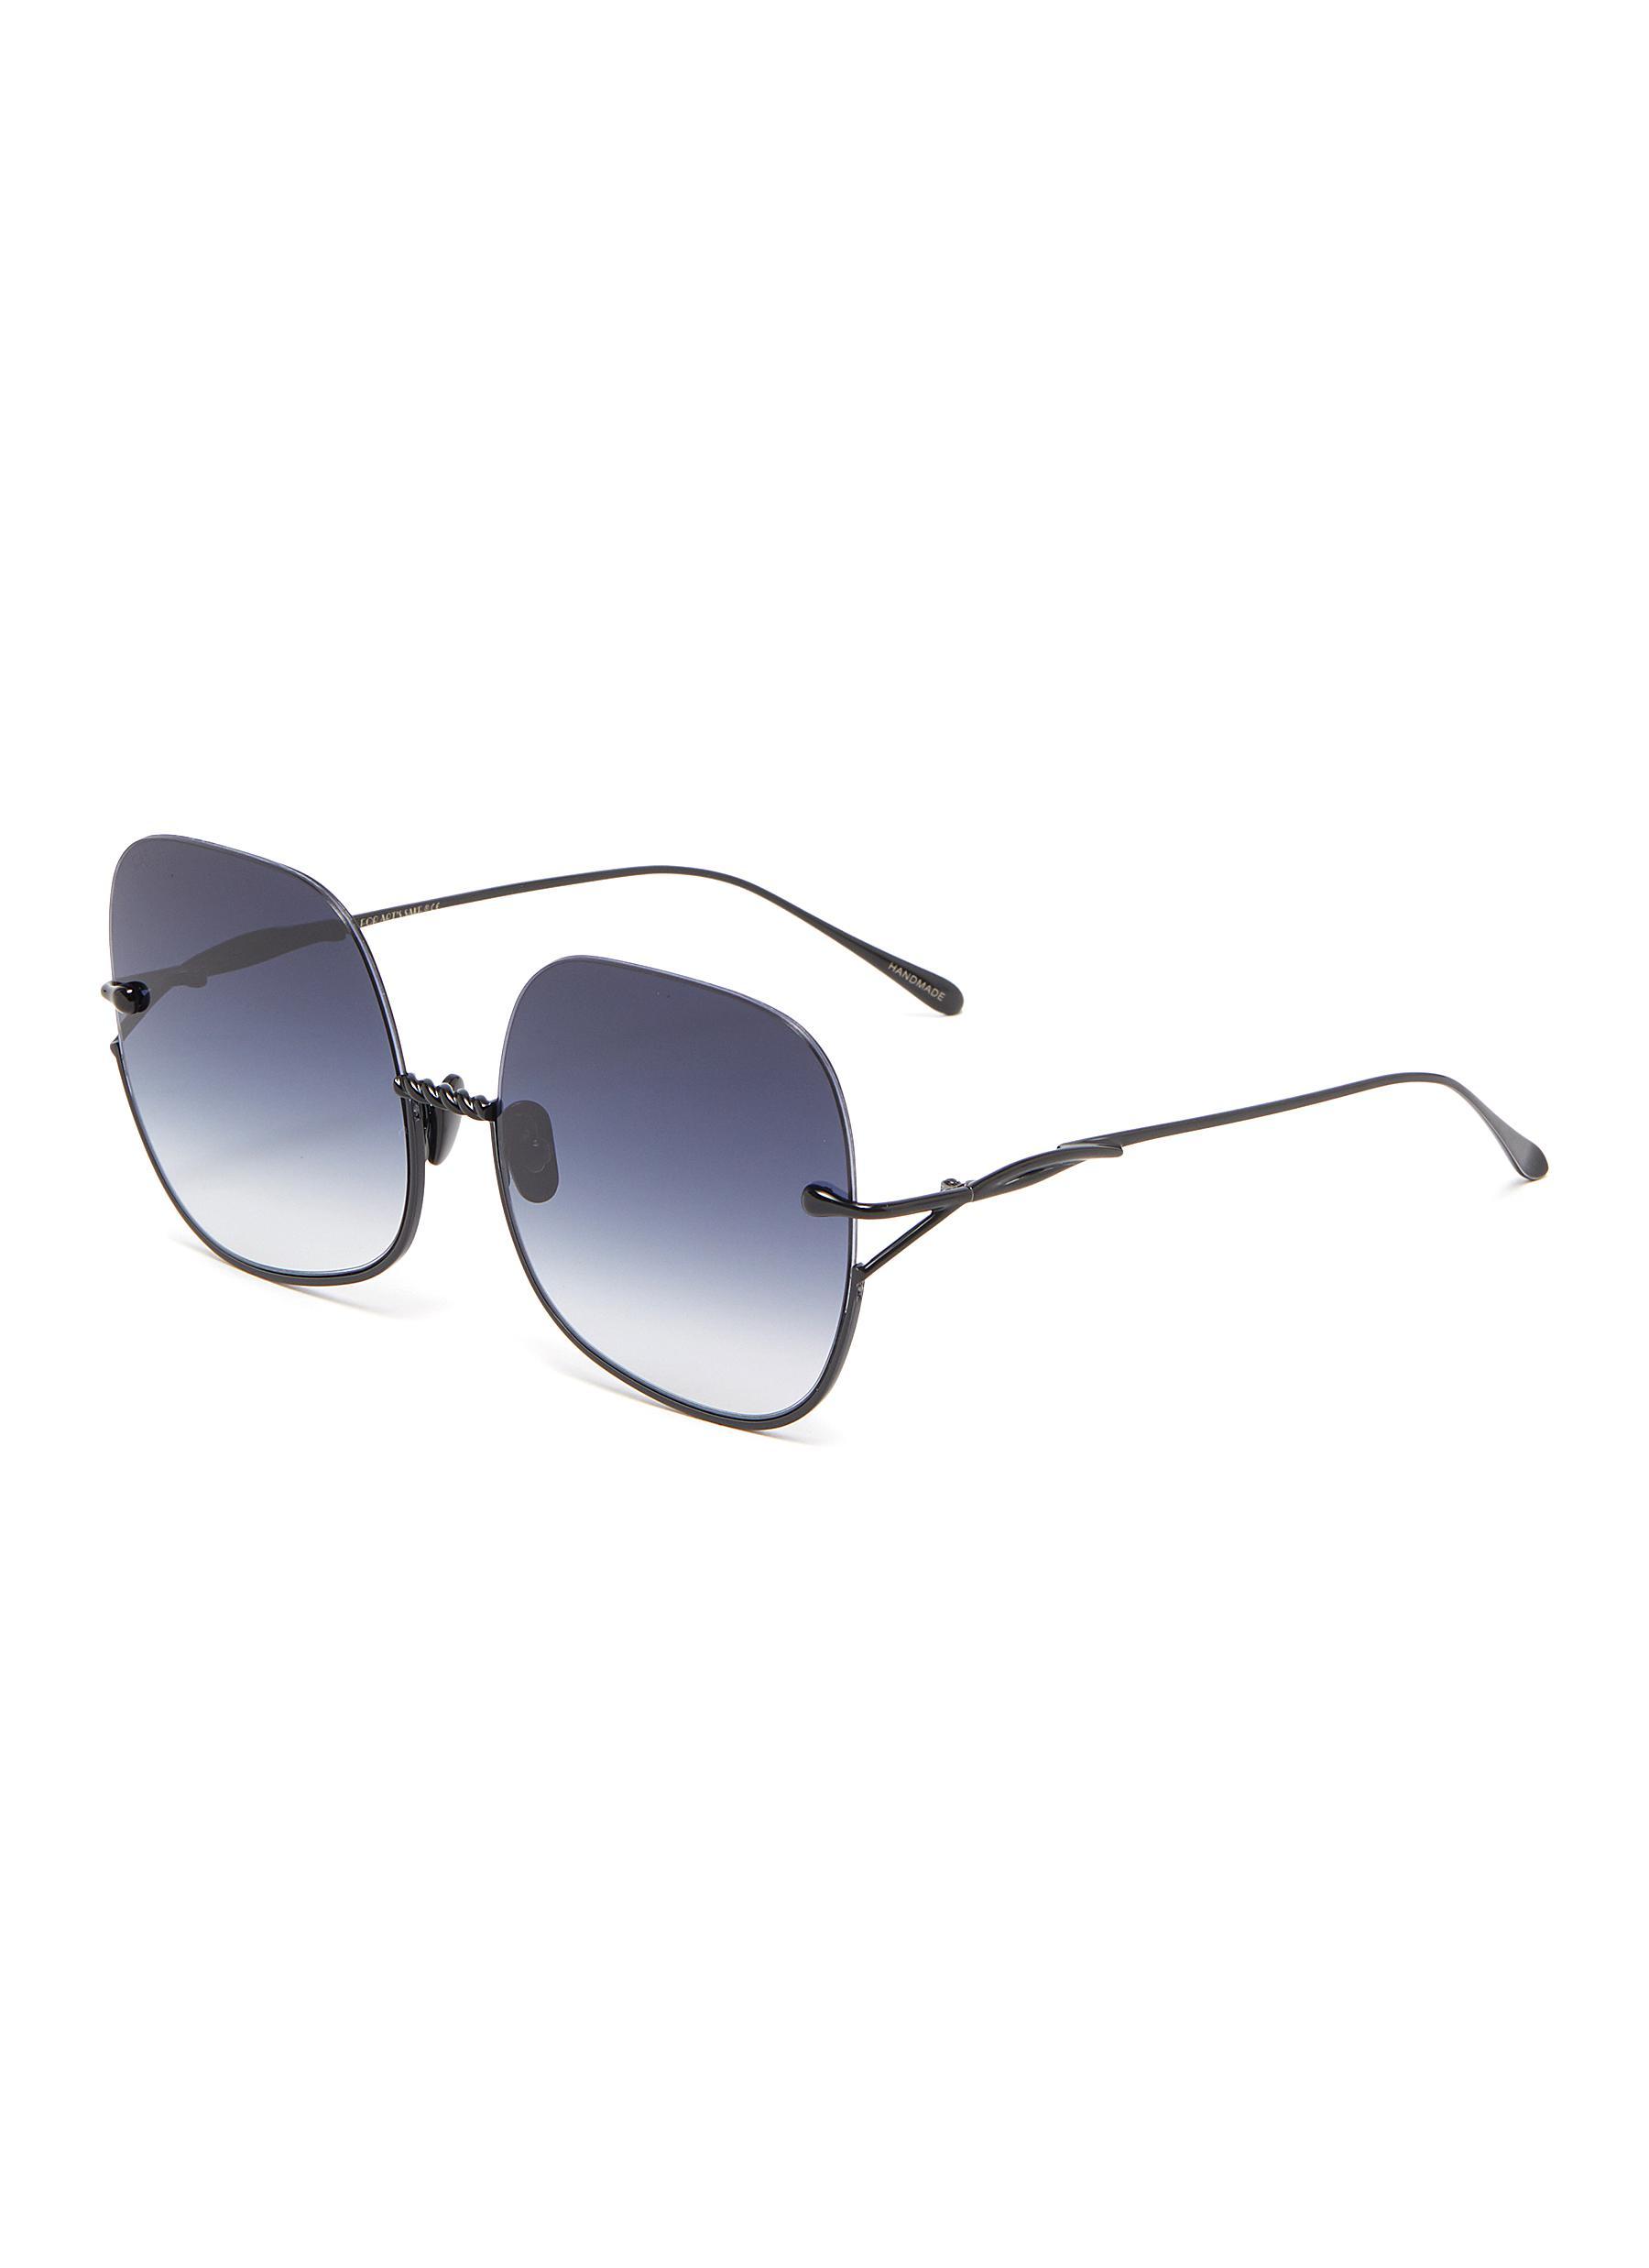 Duchess' Half Square Frame Oversized Sunglasses